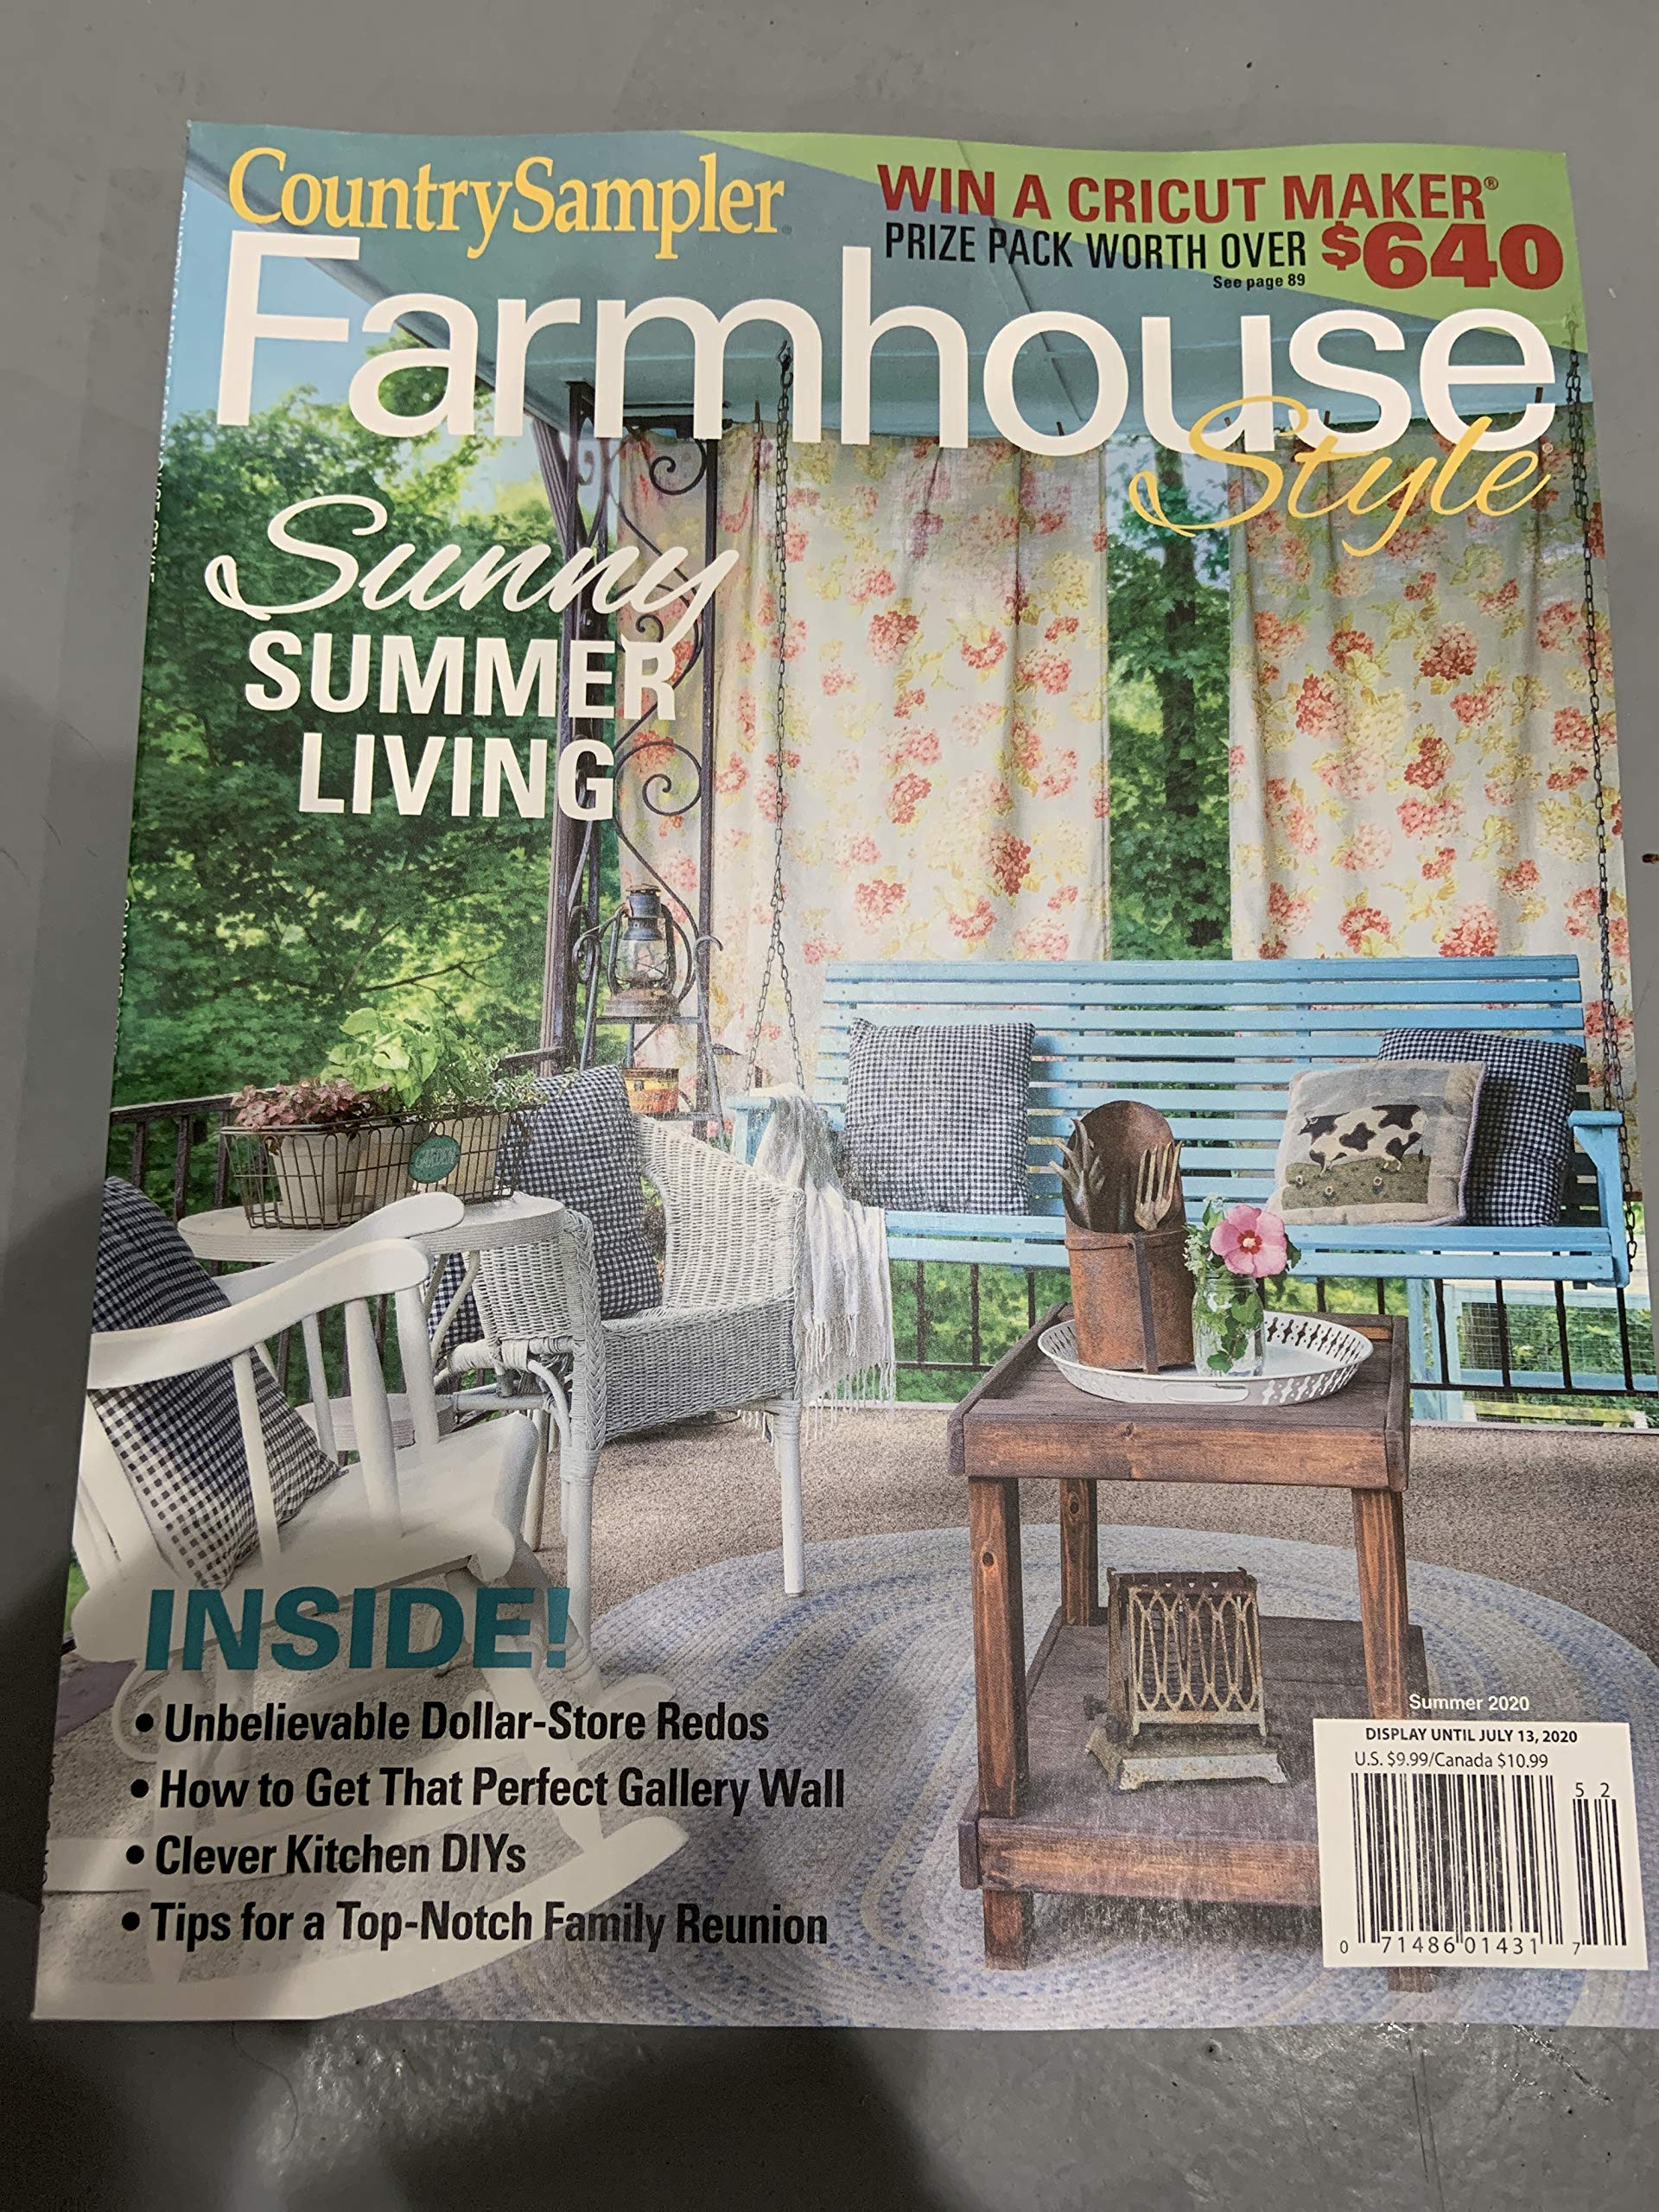 Country Sampler Farmhouse Style Magazine Summer 2020 Sunny Summer Living Generic Amazon Com Books